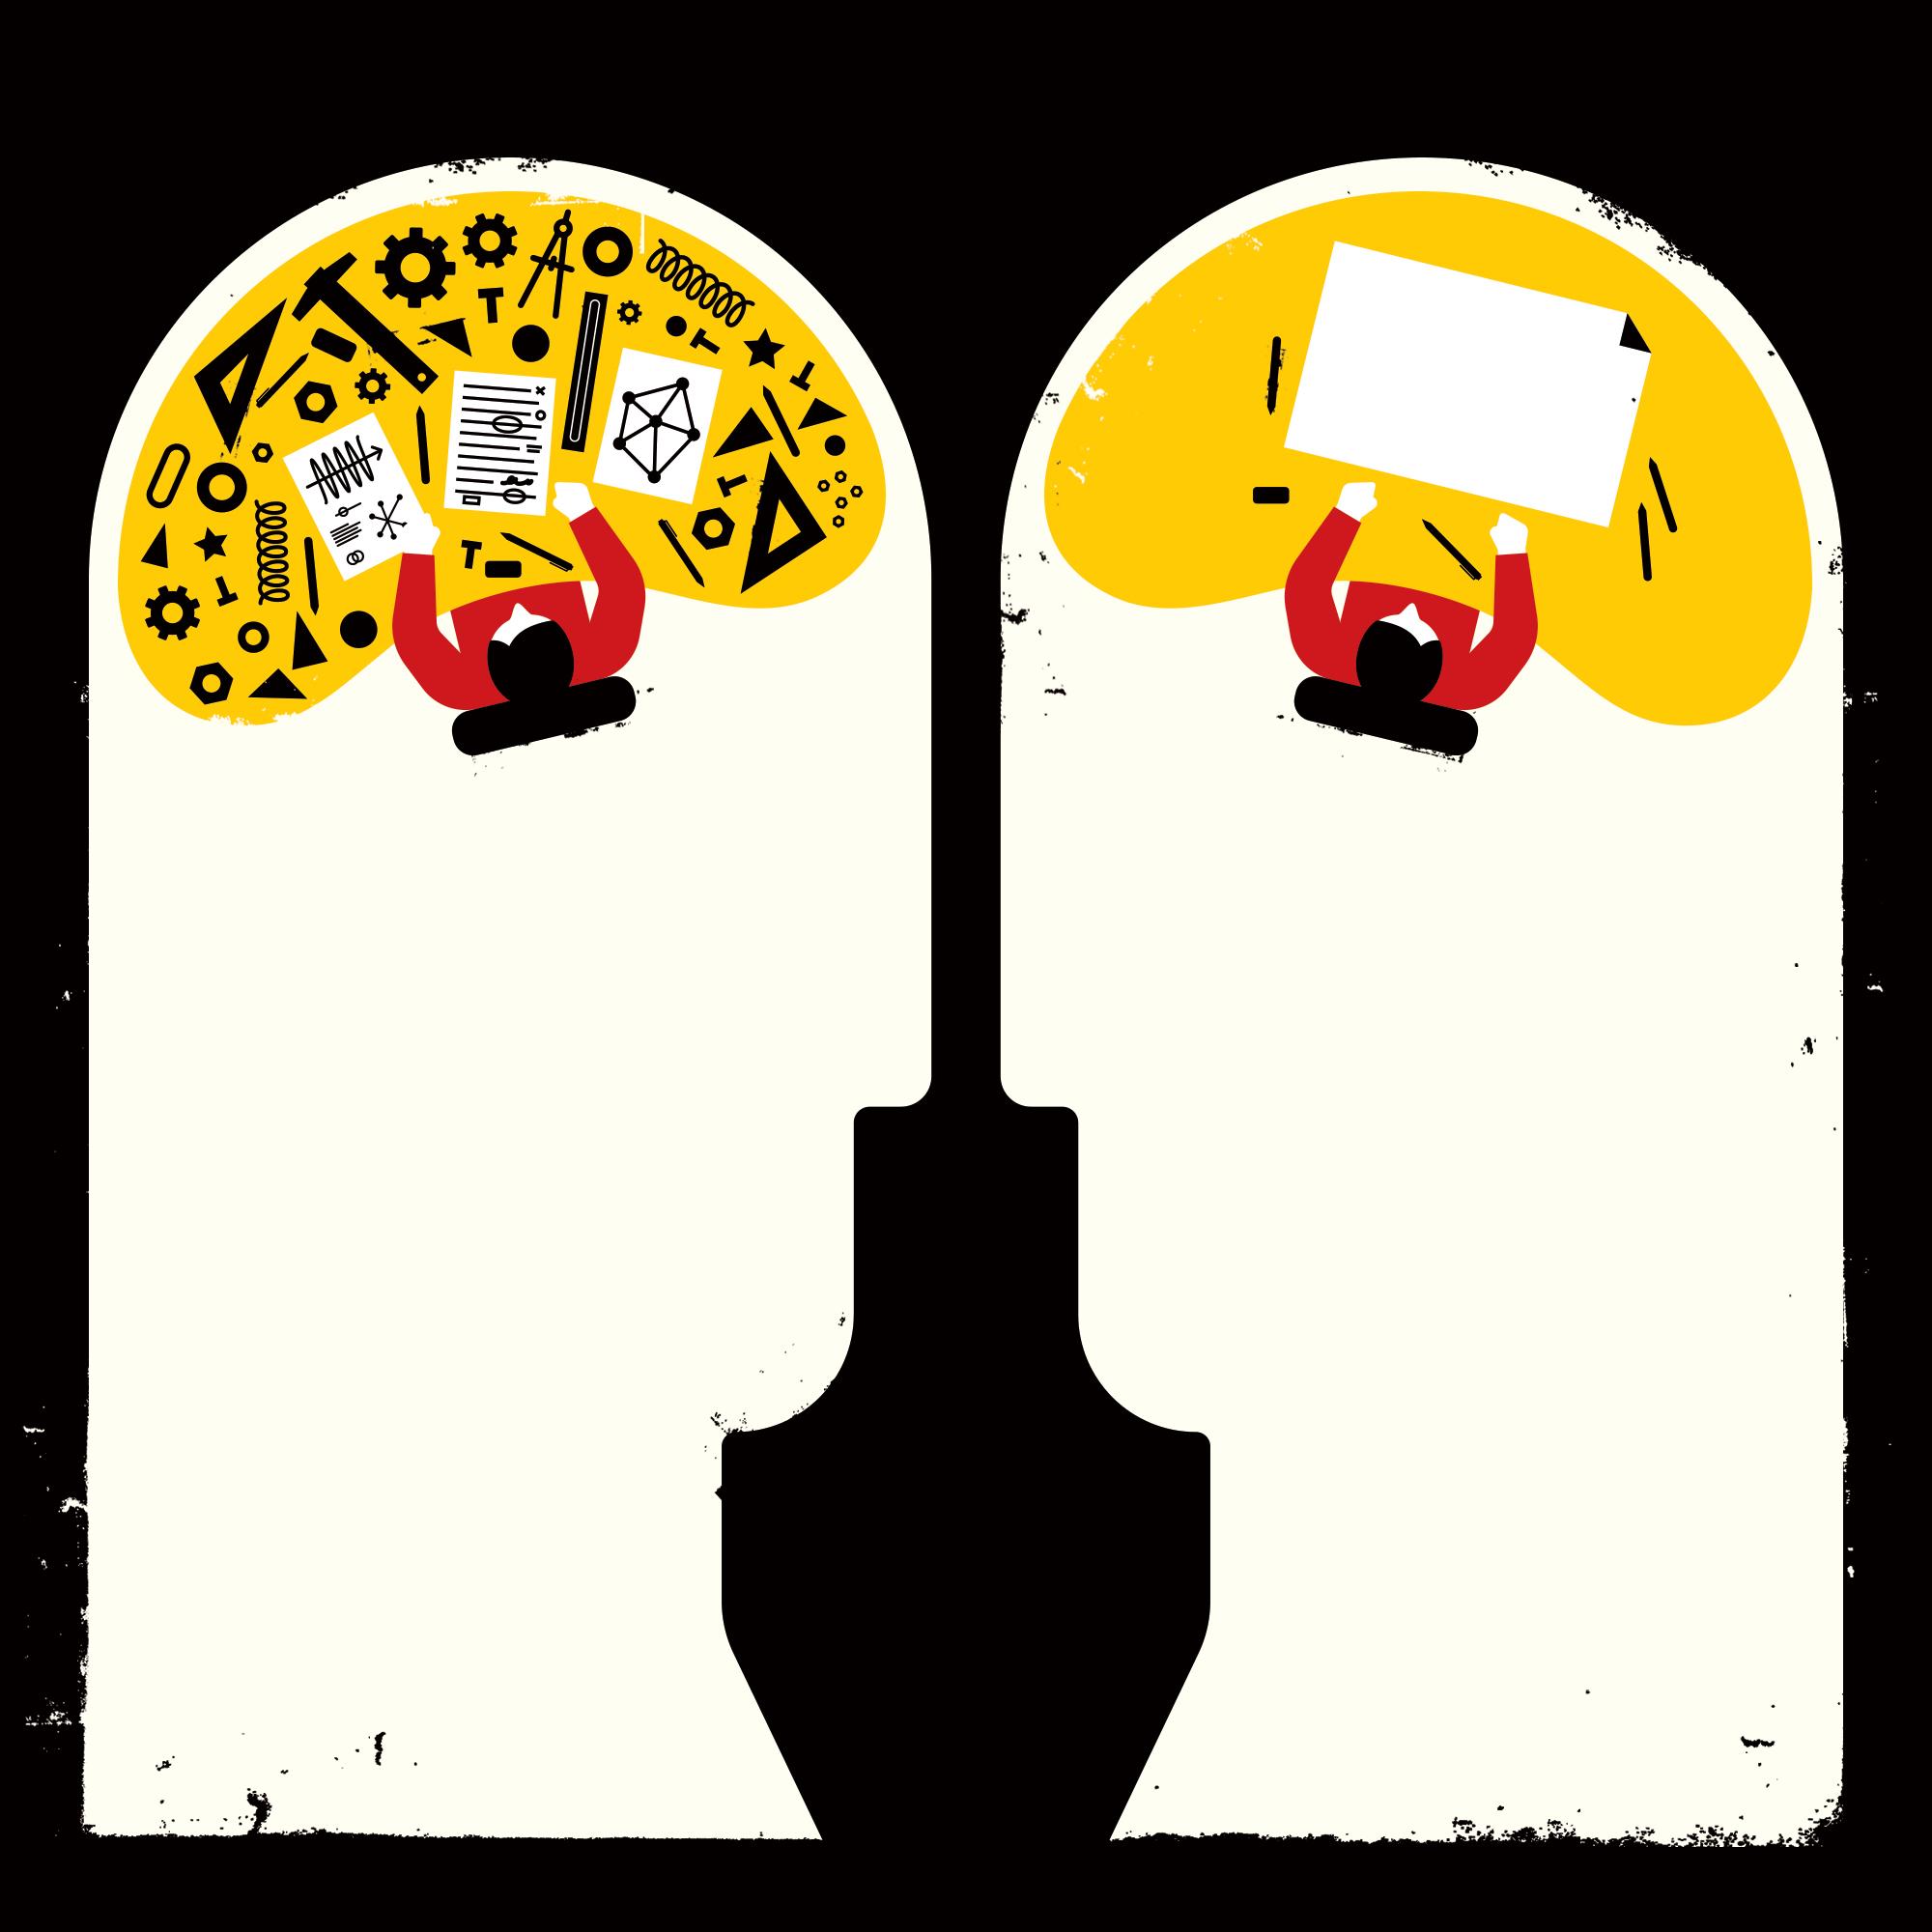 Analytical Vs Insightful Thinking